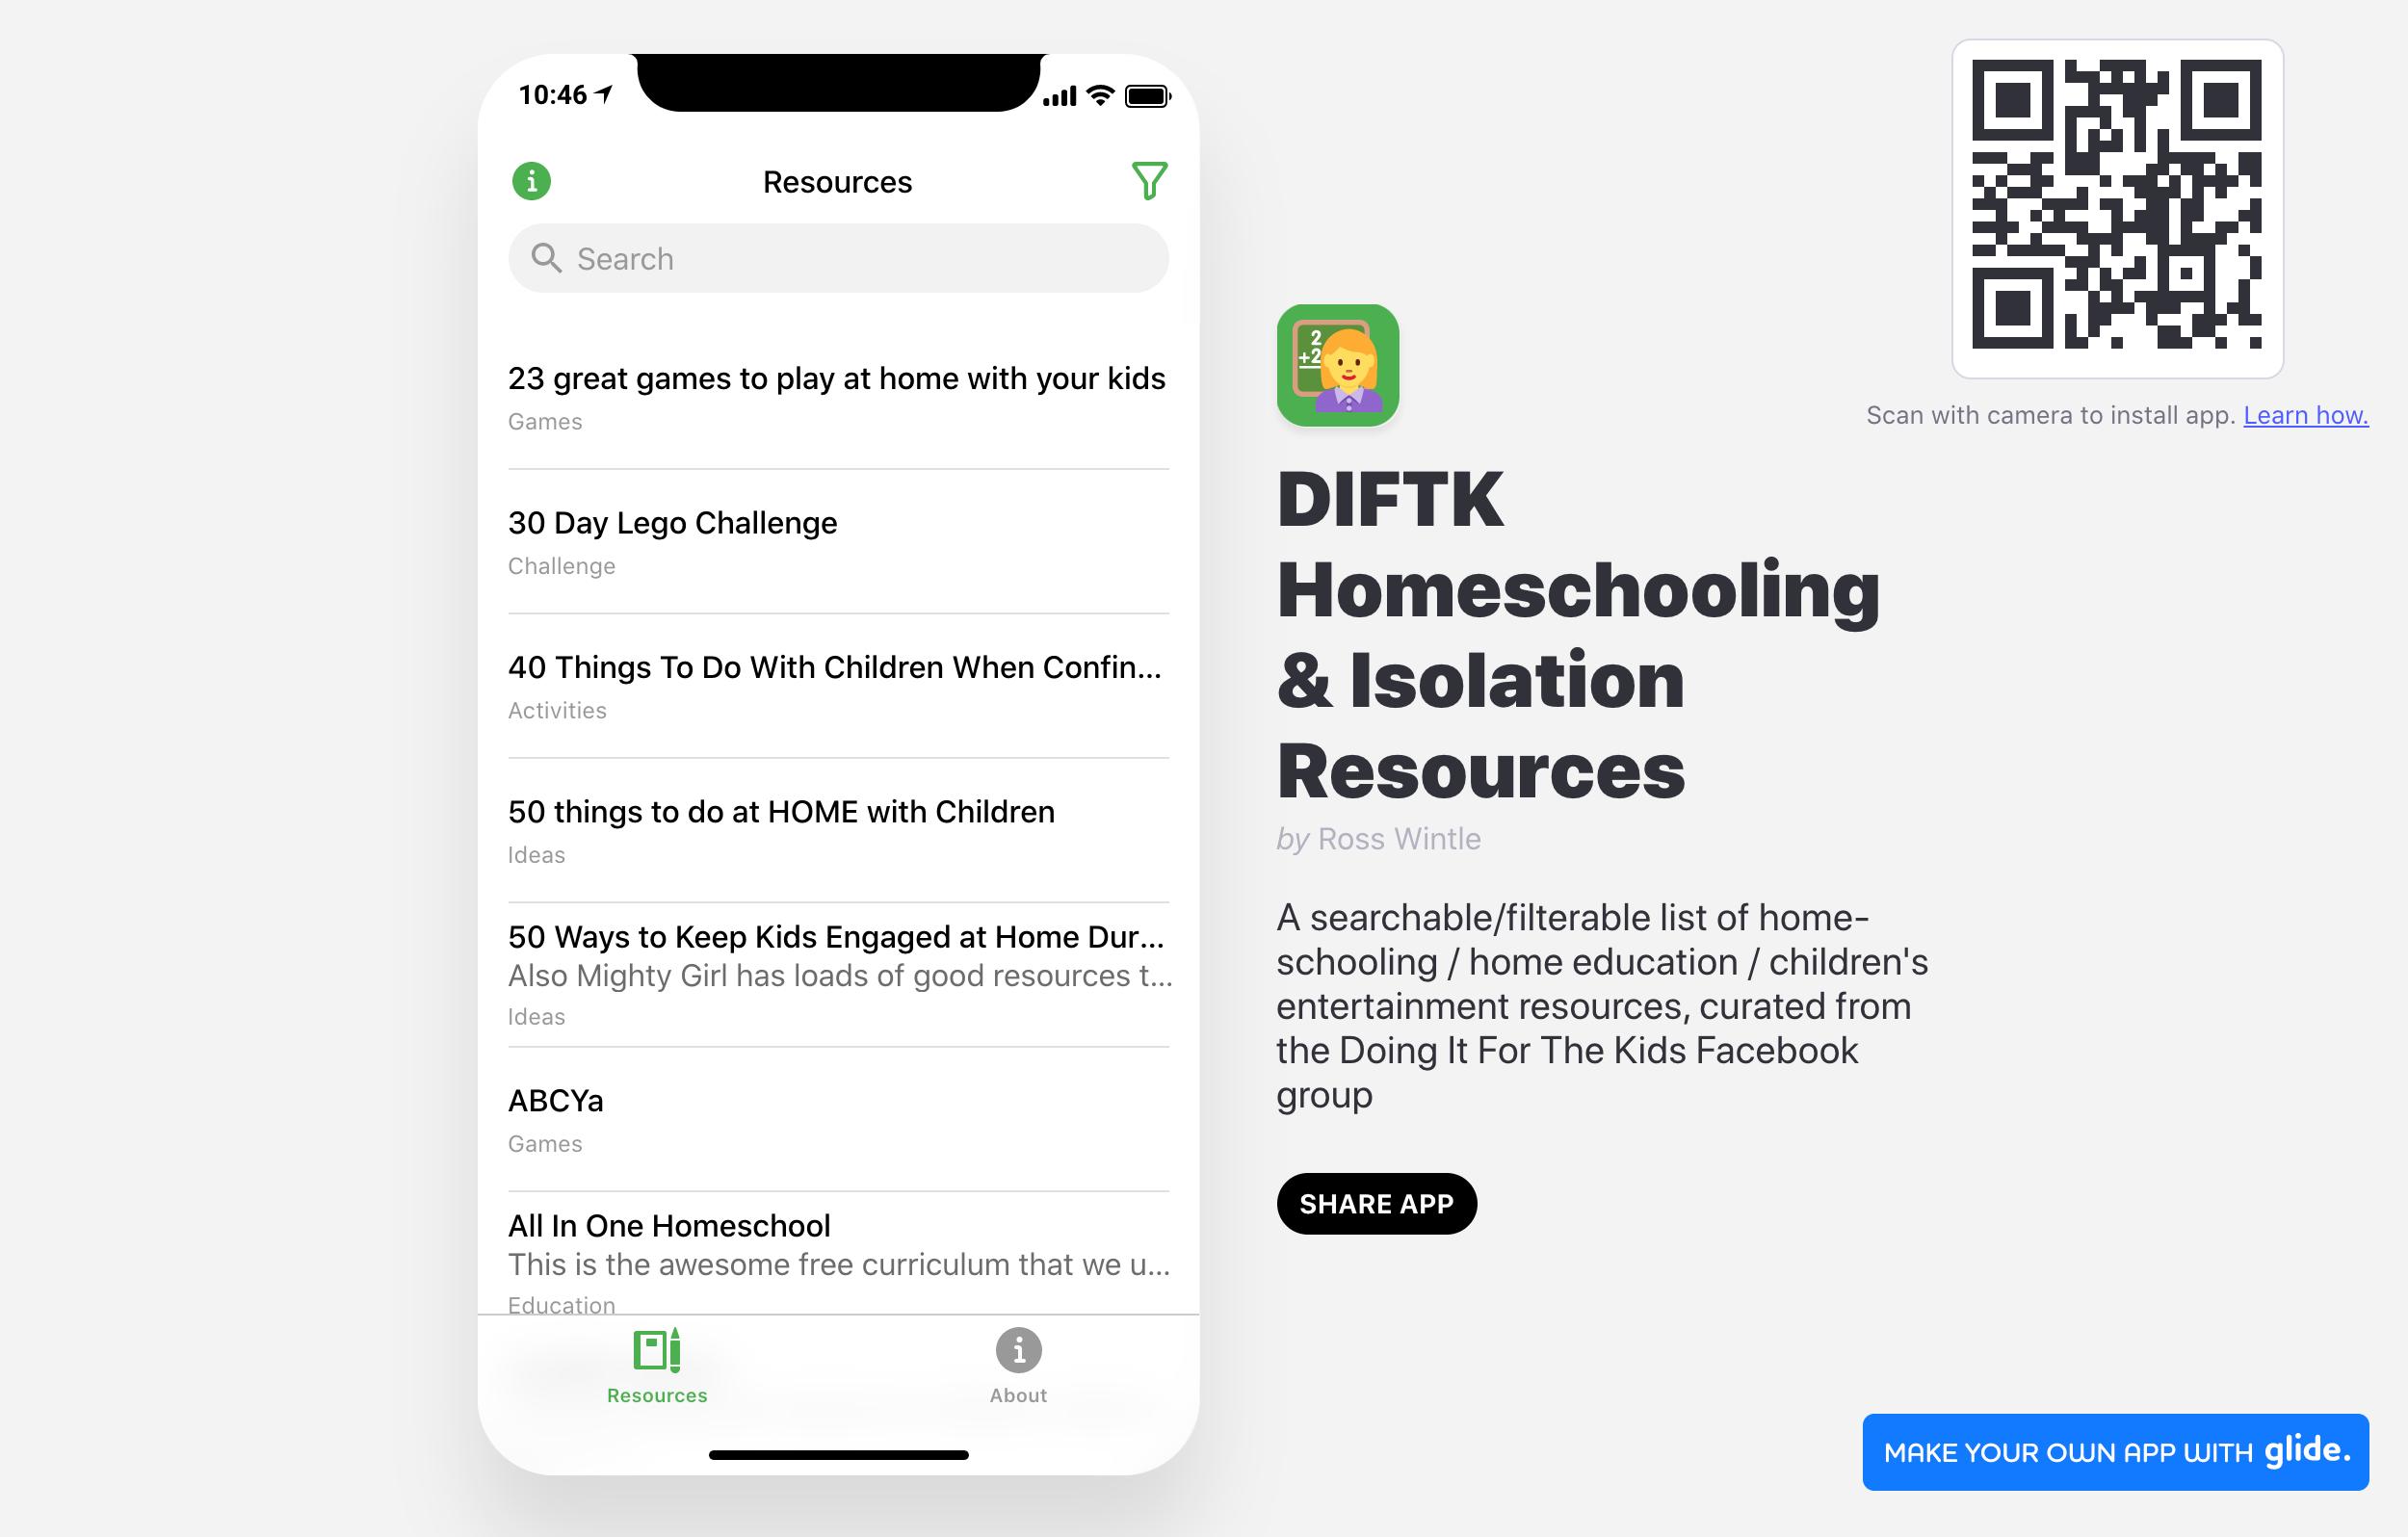 DIFTK Homeschooling & Isolation Resources